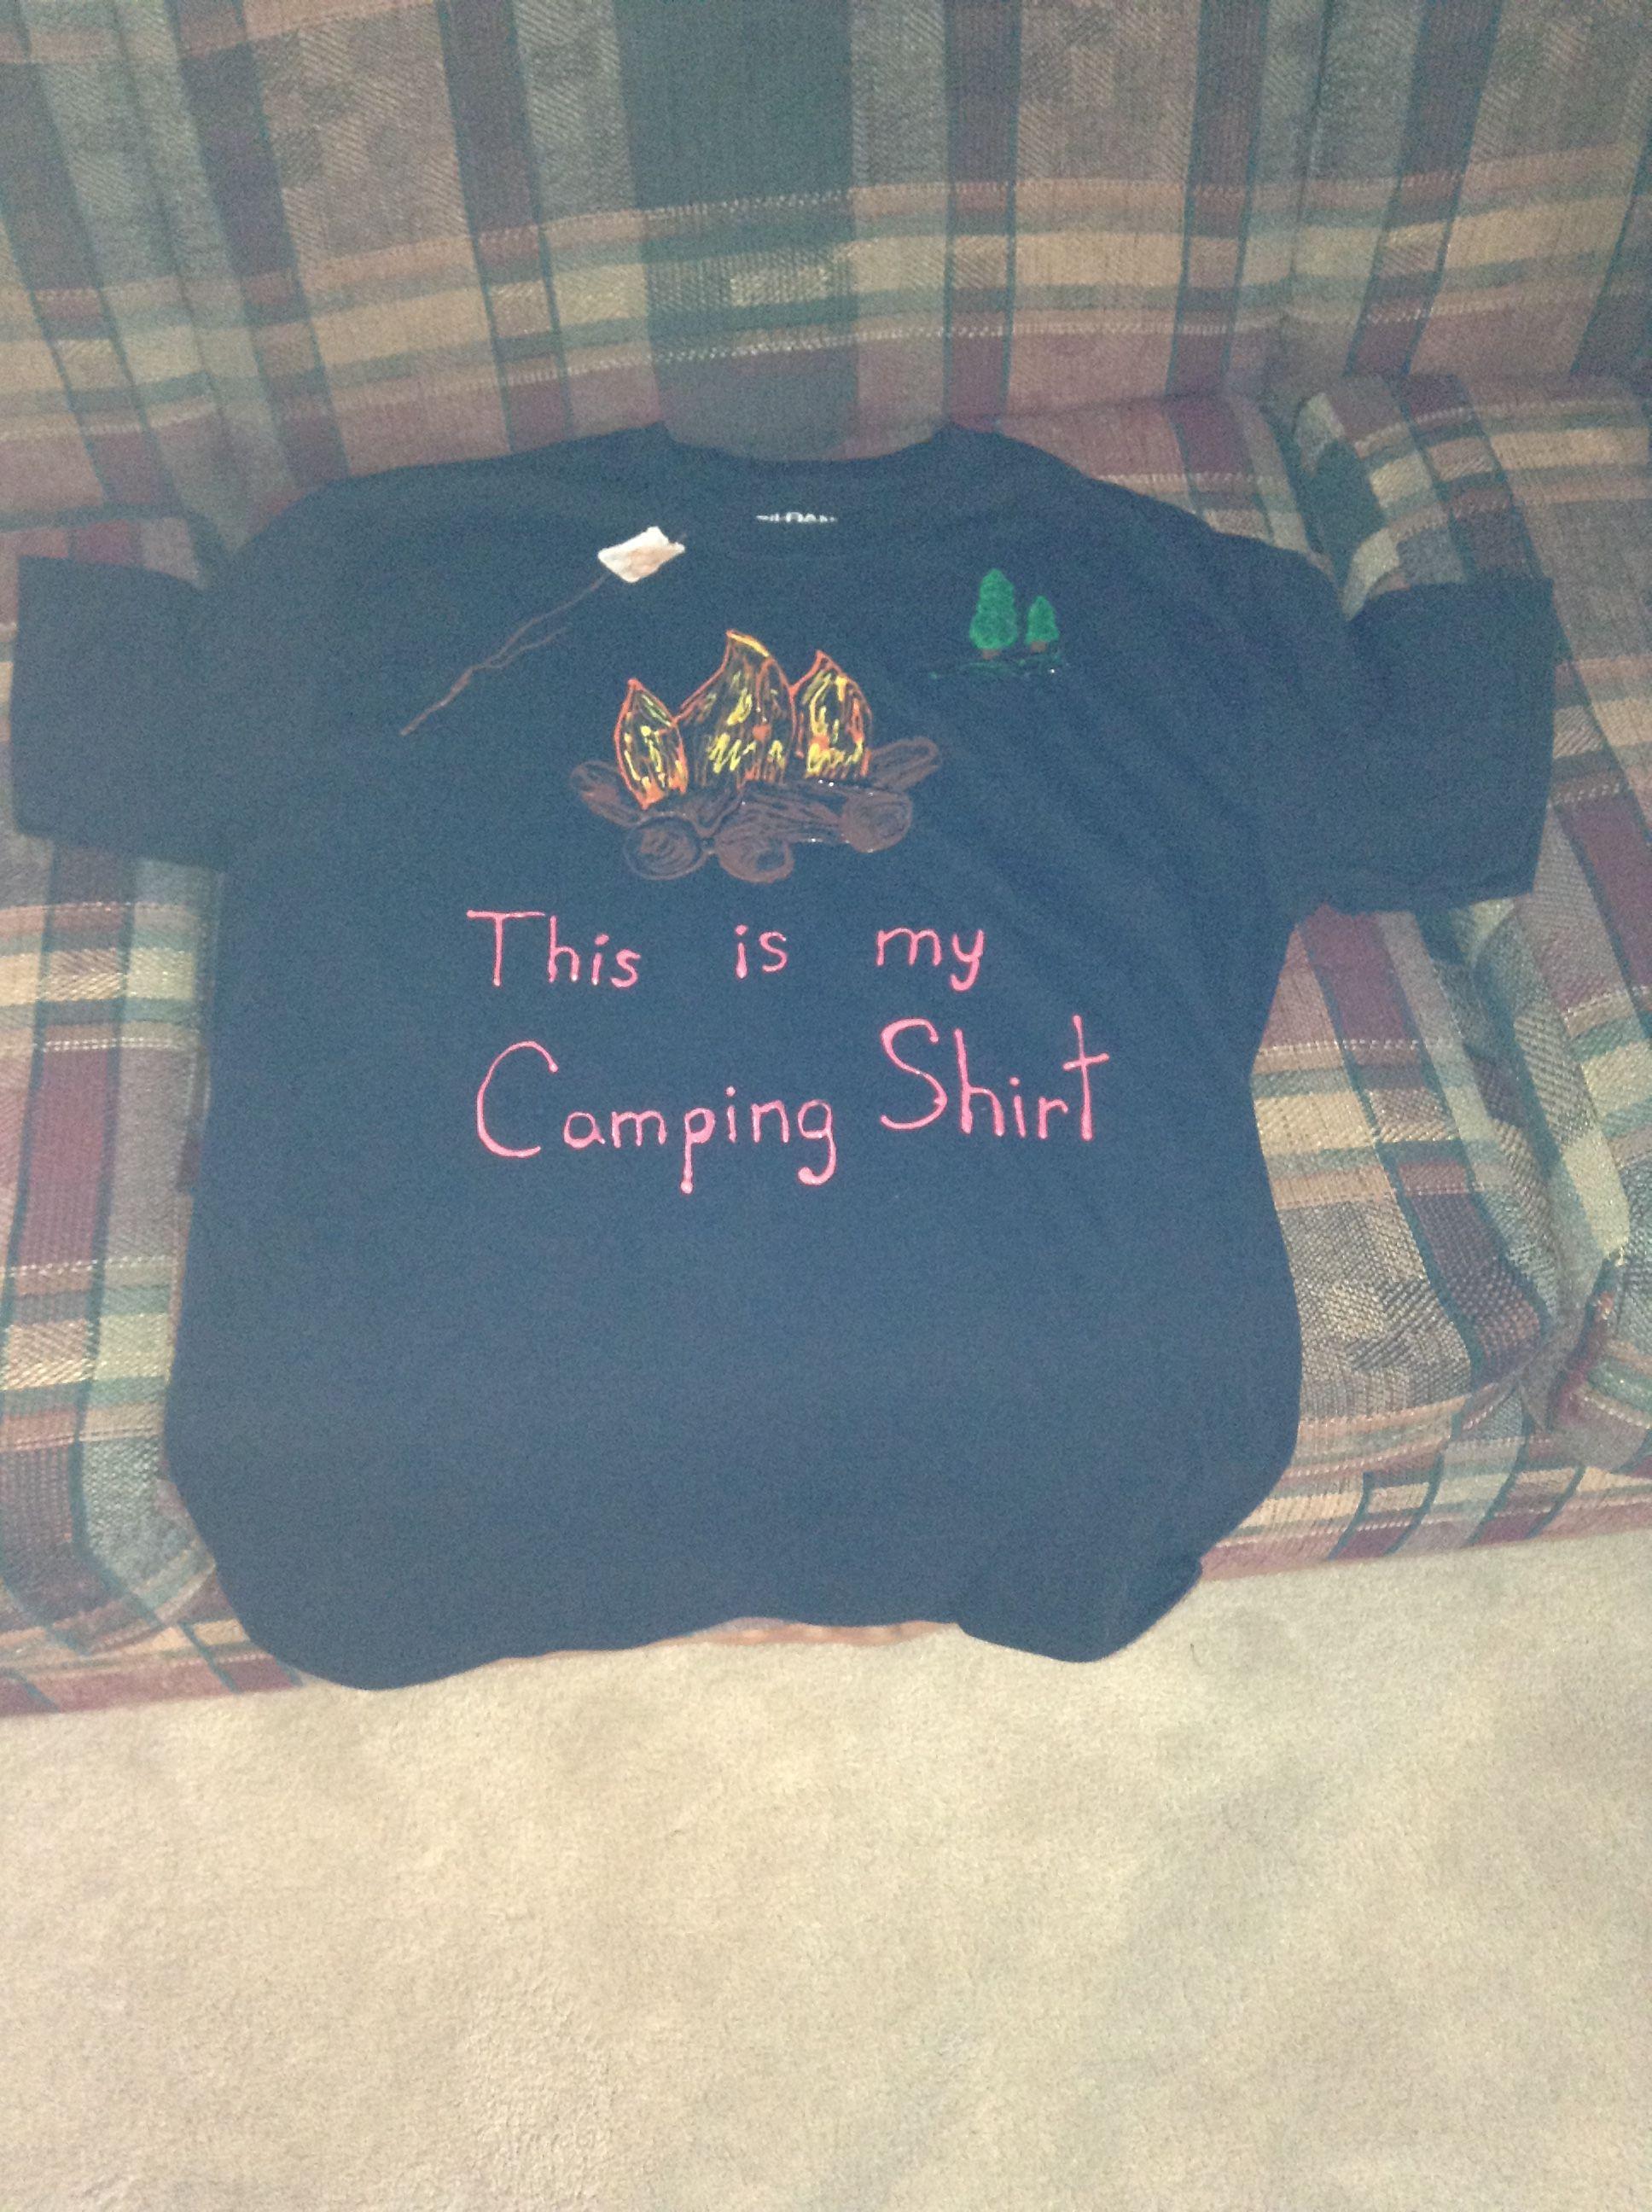 Puffy Paint Camping Shirt Puffy Paint Shirts Puff Paint Shirts Puffy Paint